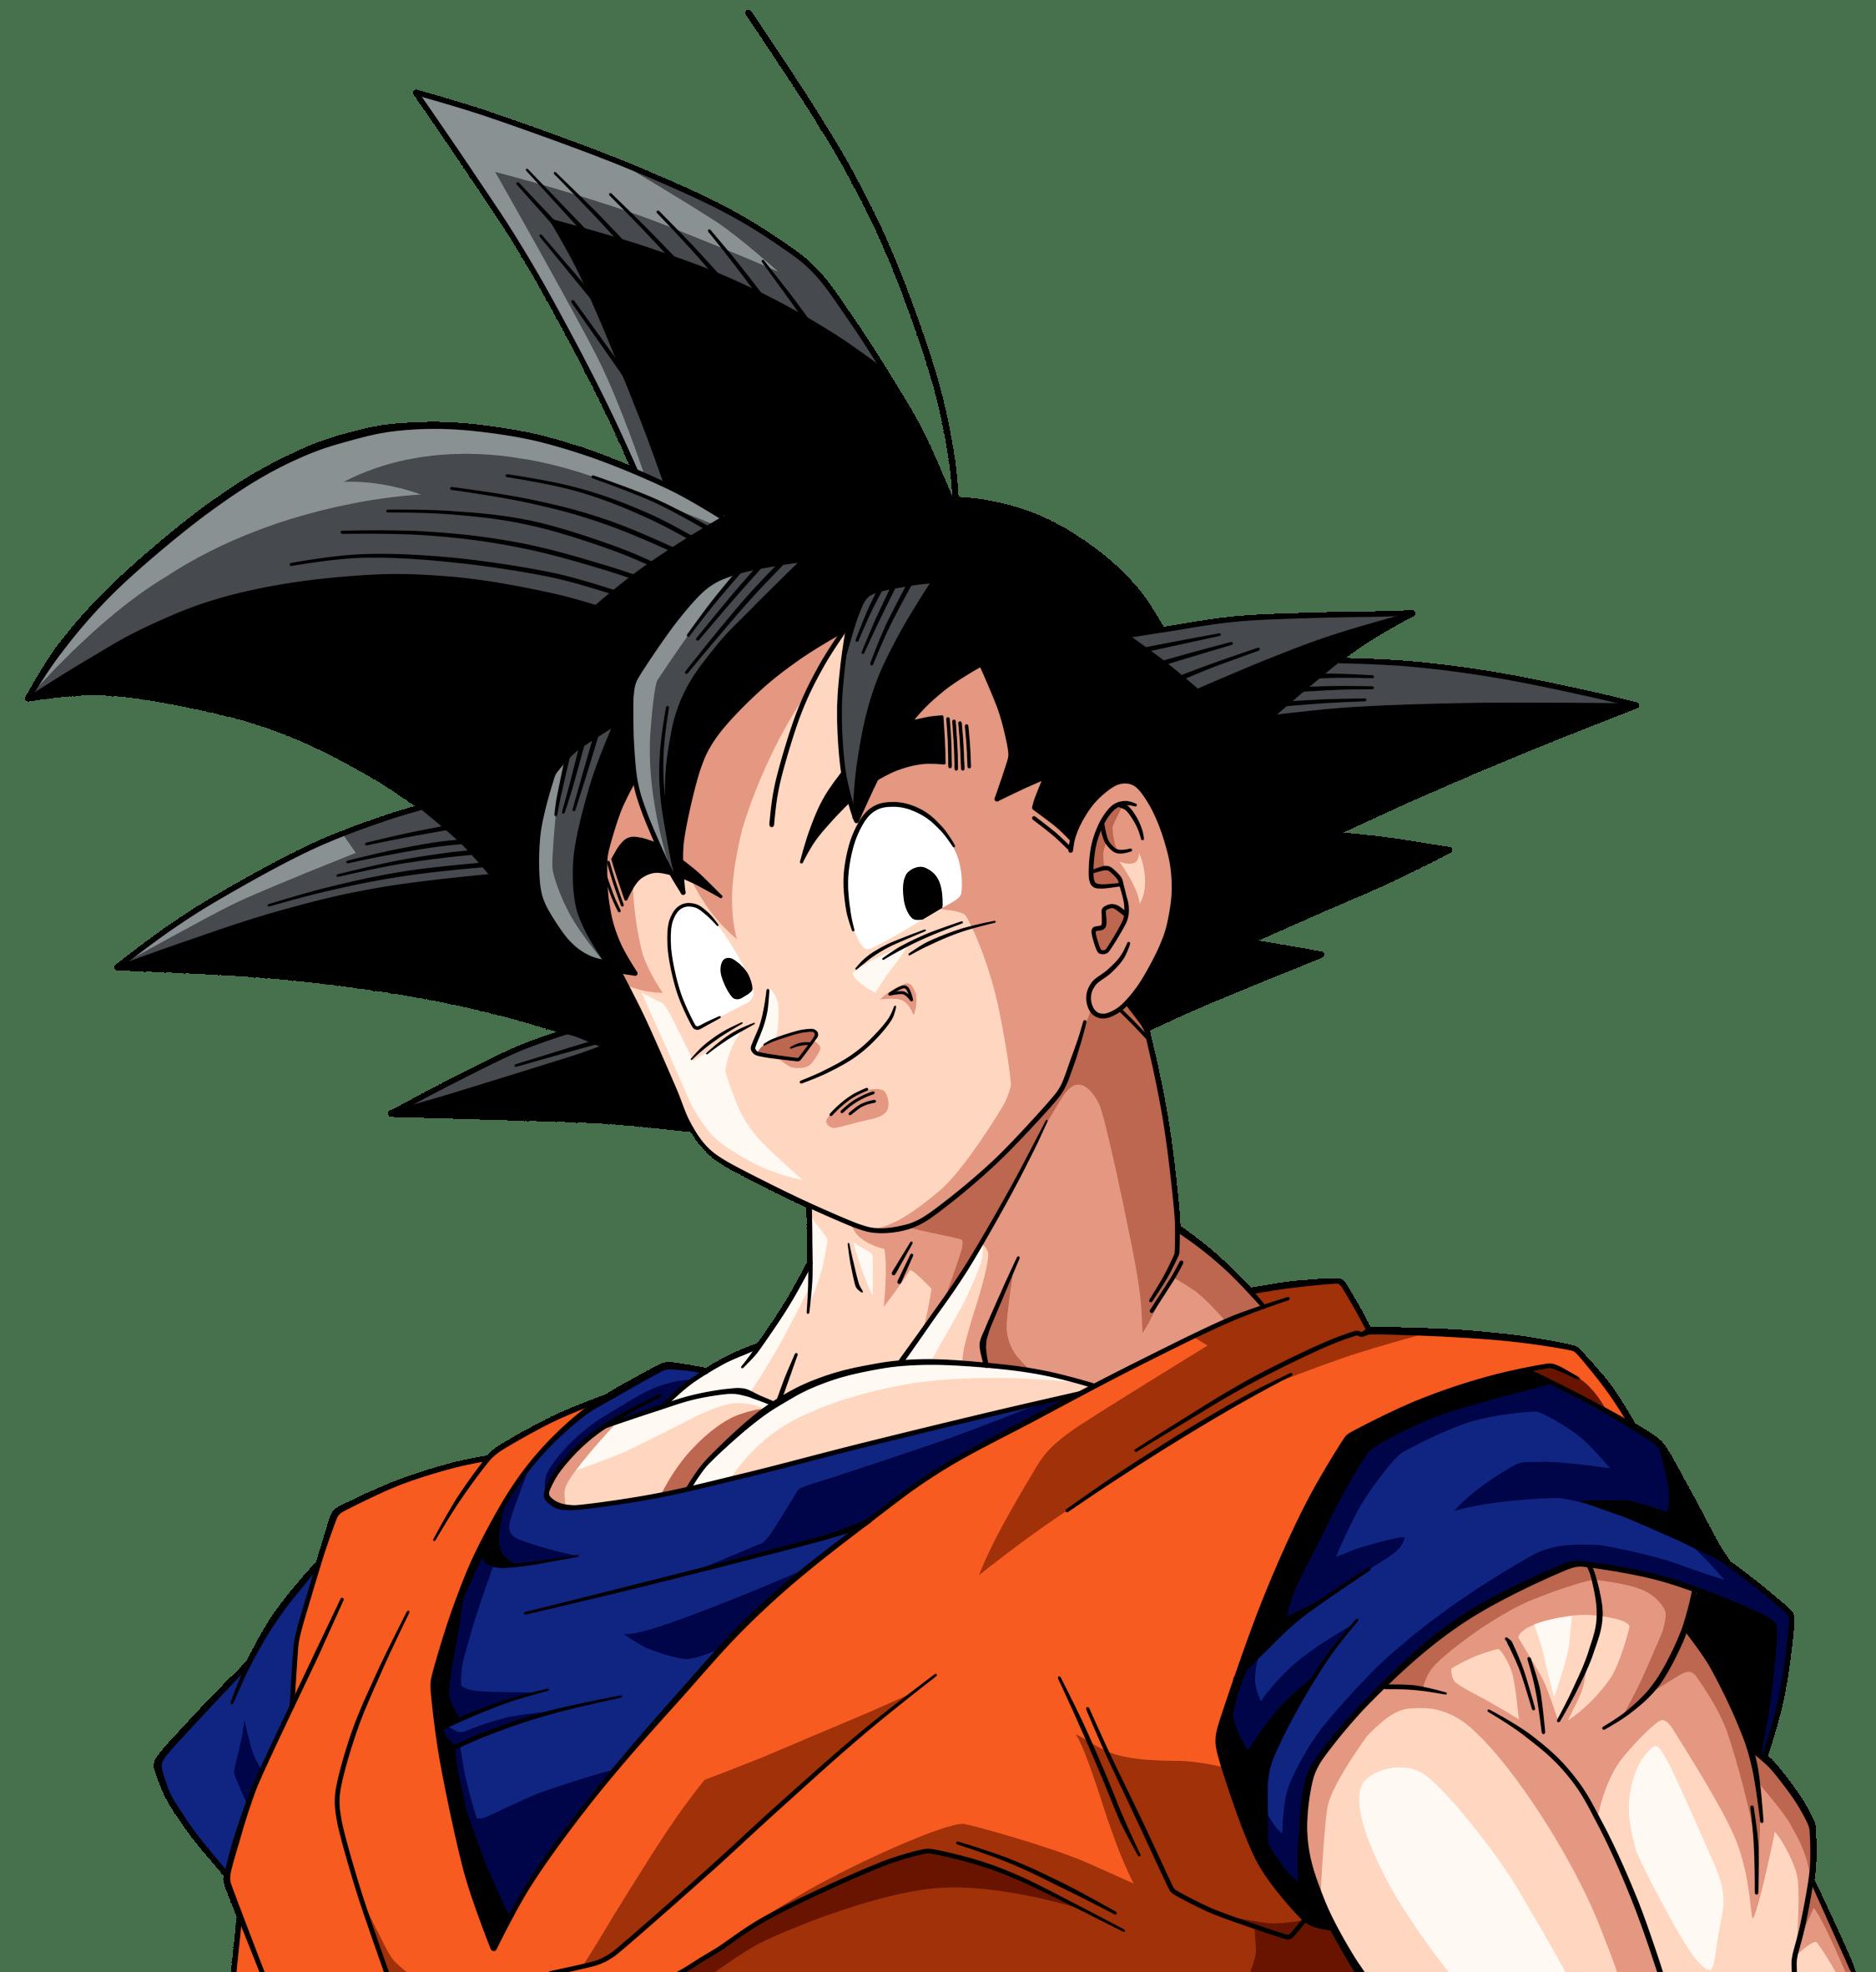 Goku Clipart at GetDrawings.com.